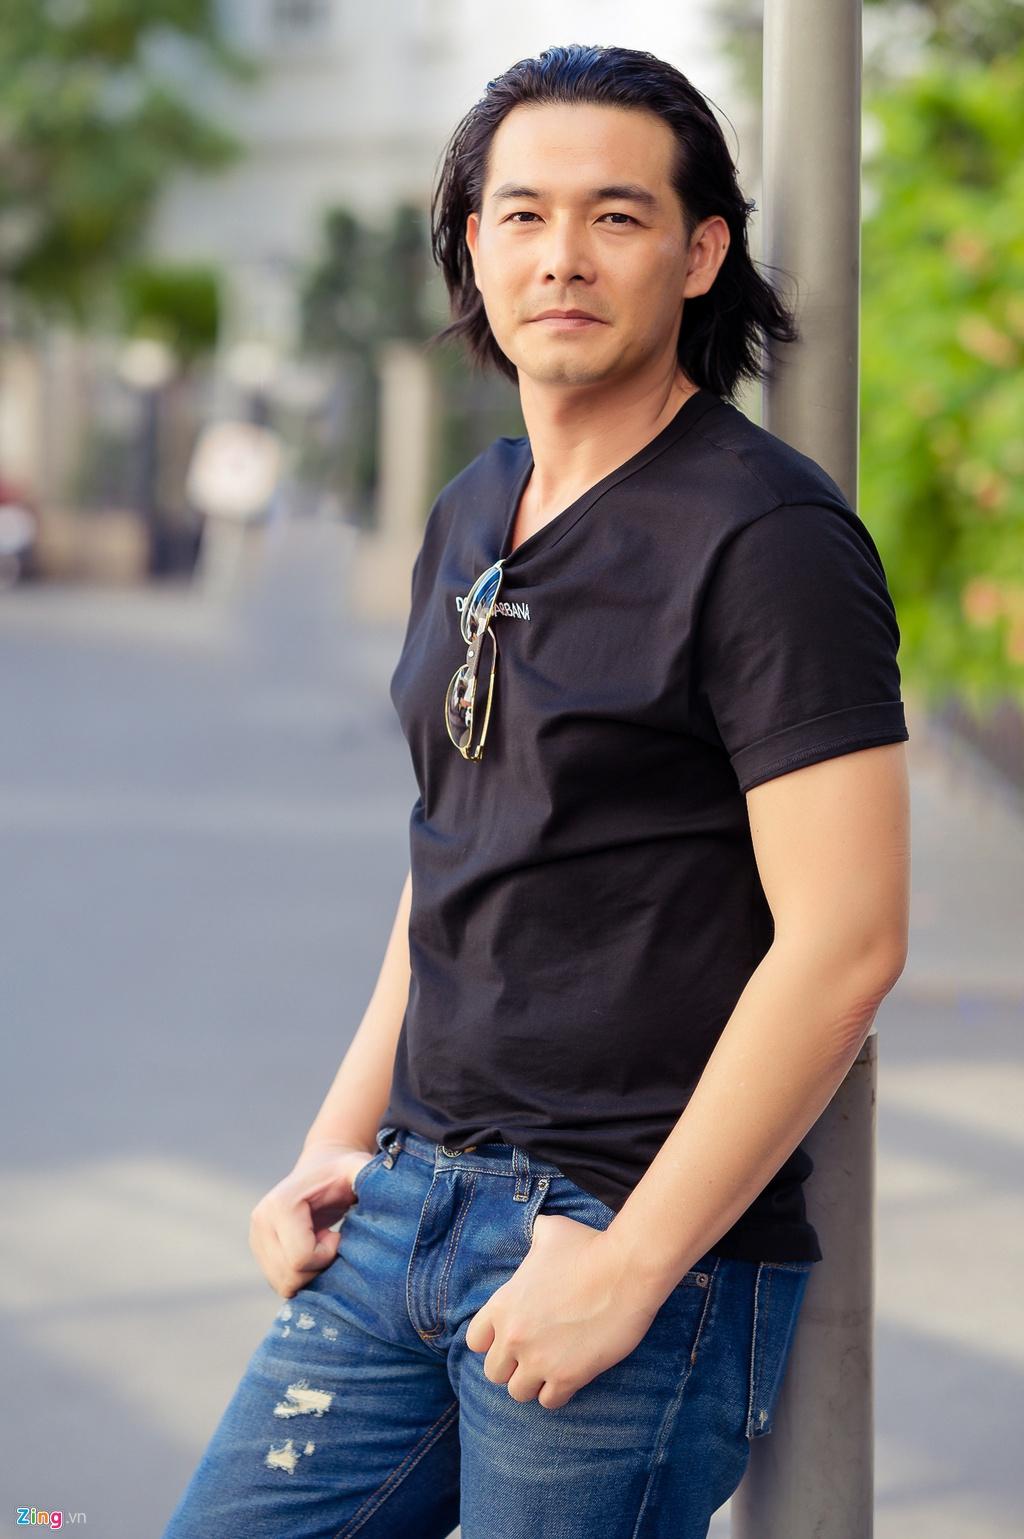 Quach Ngoc Ngoan: 'Nguoi ta che toi phat tuong, xuong sac cung dung' hinh anh 3 NGUYEN_BA_NGOC_ZING_3944.jpg